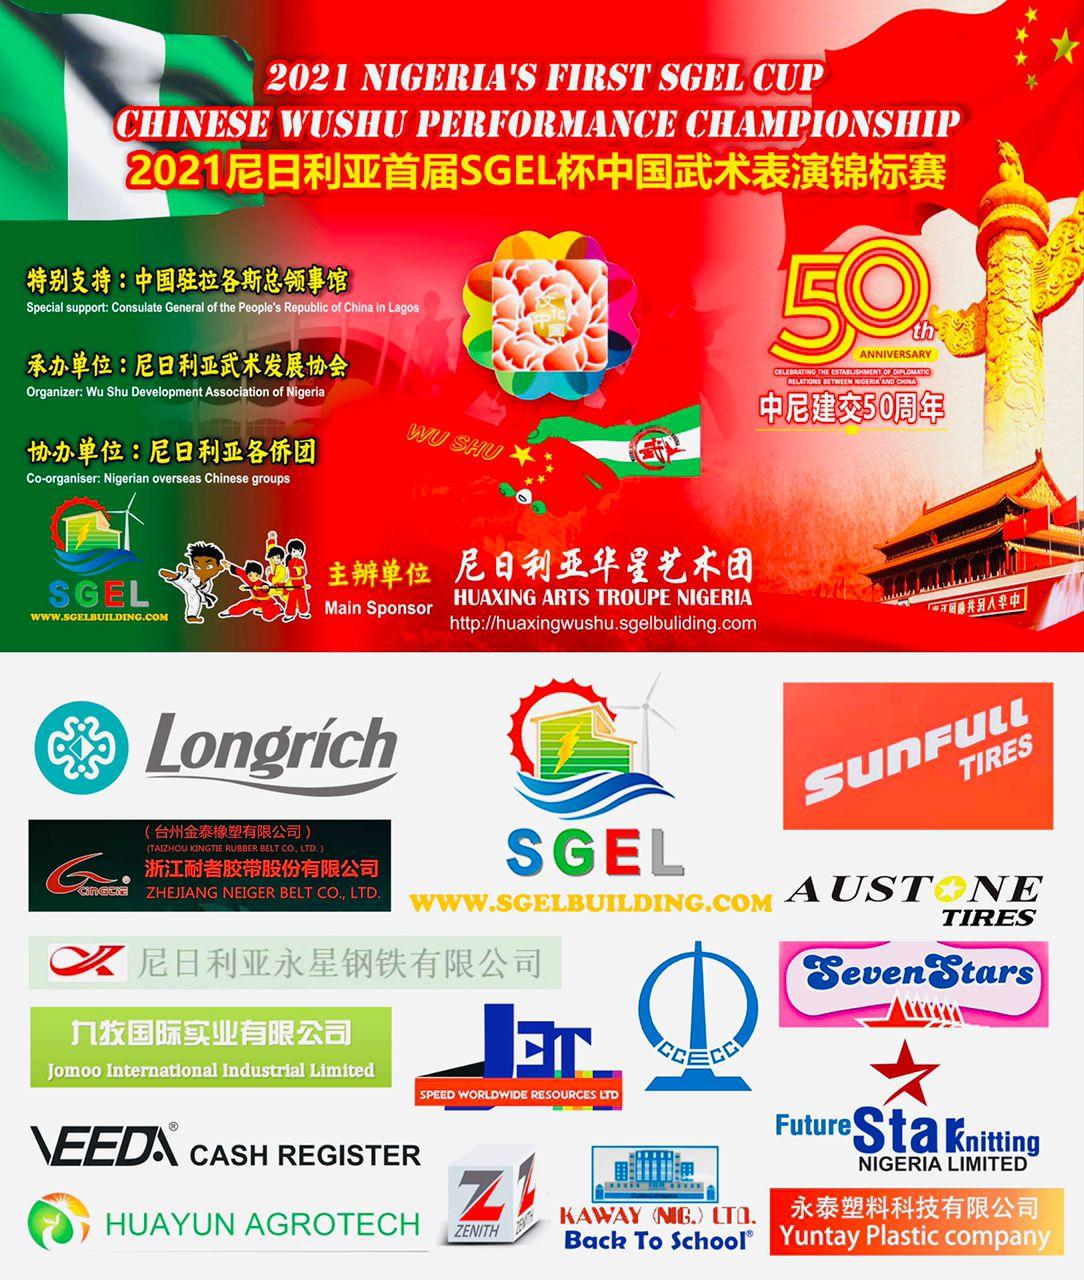 10 Raffle Draw Winners Emerge at SGEL Chinese Wushu Performance